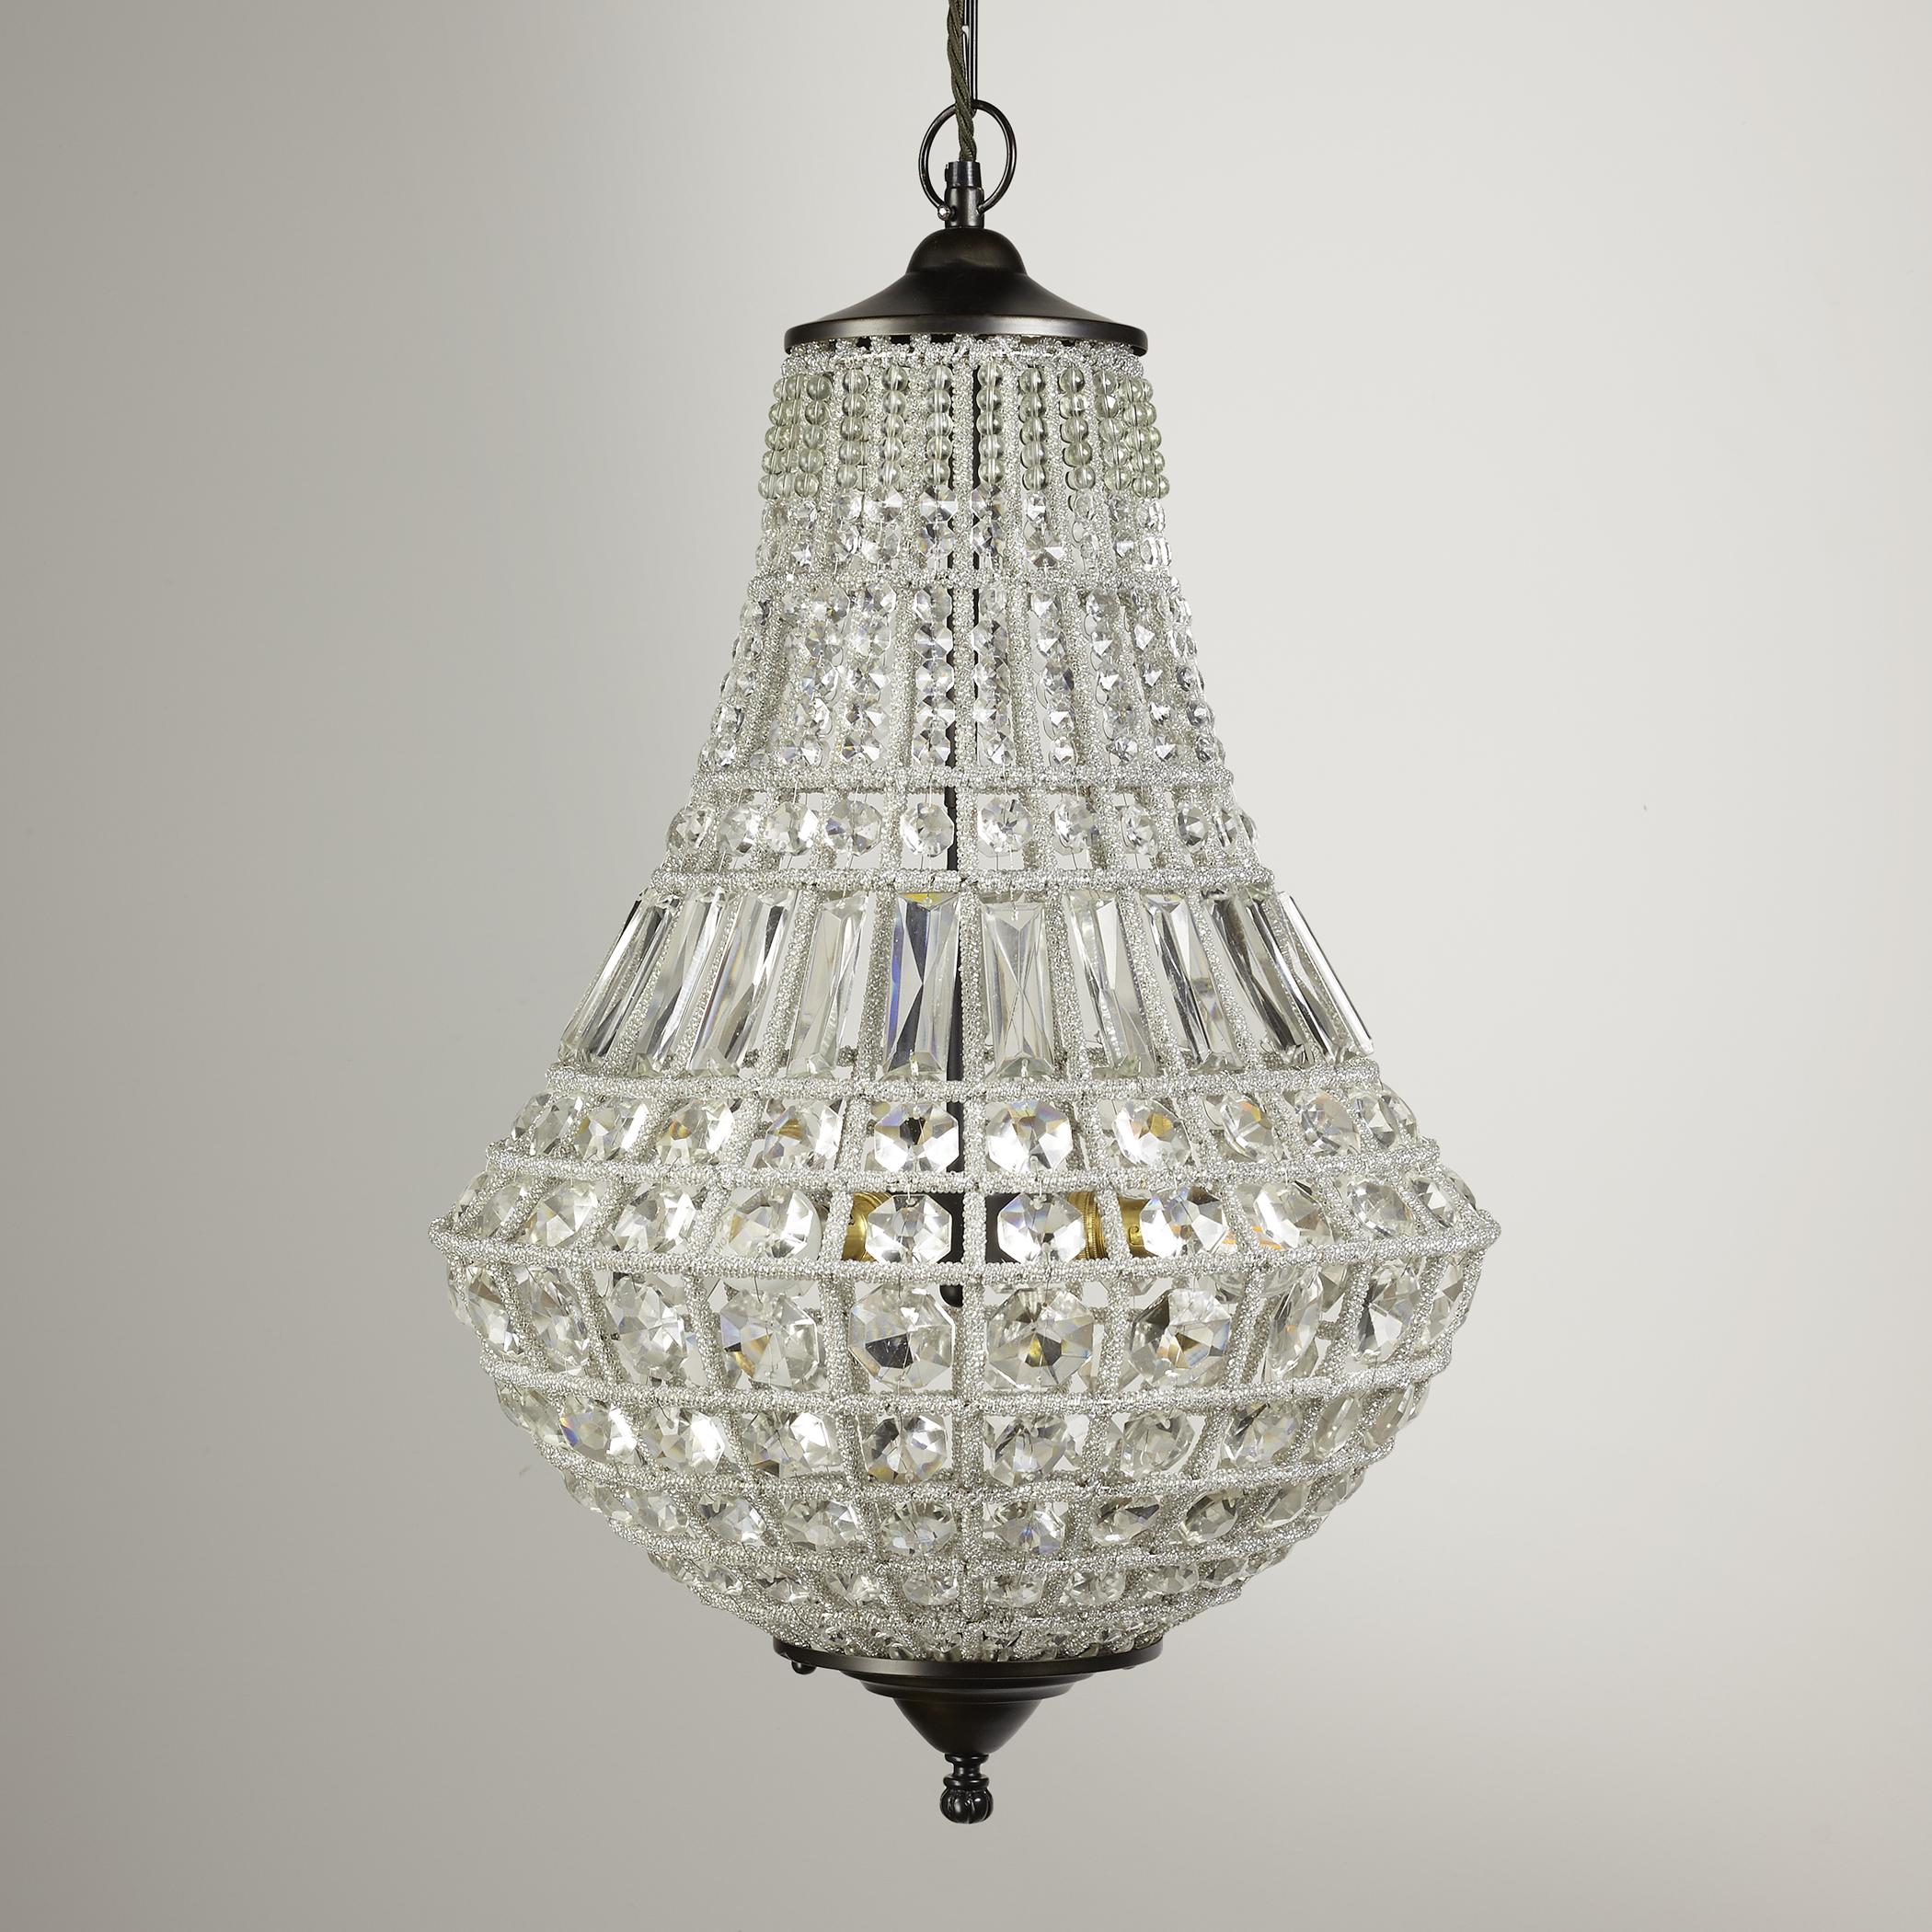 Lighting Antique Chandelier Crystals Tear Drop Shape